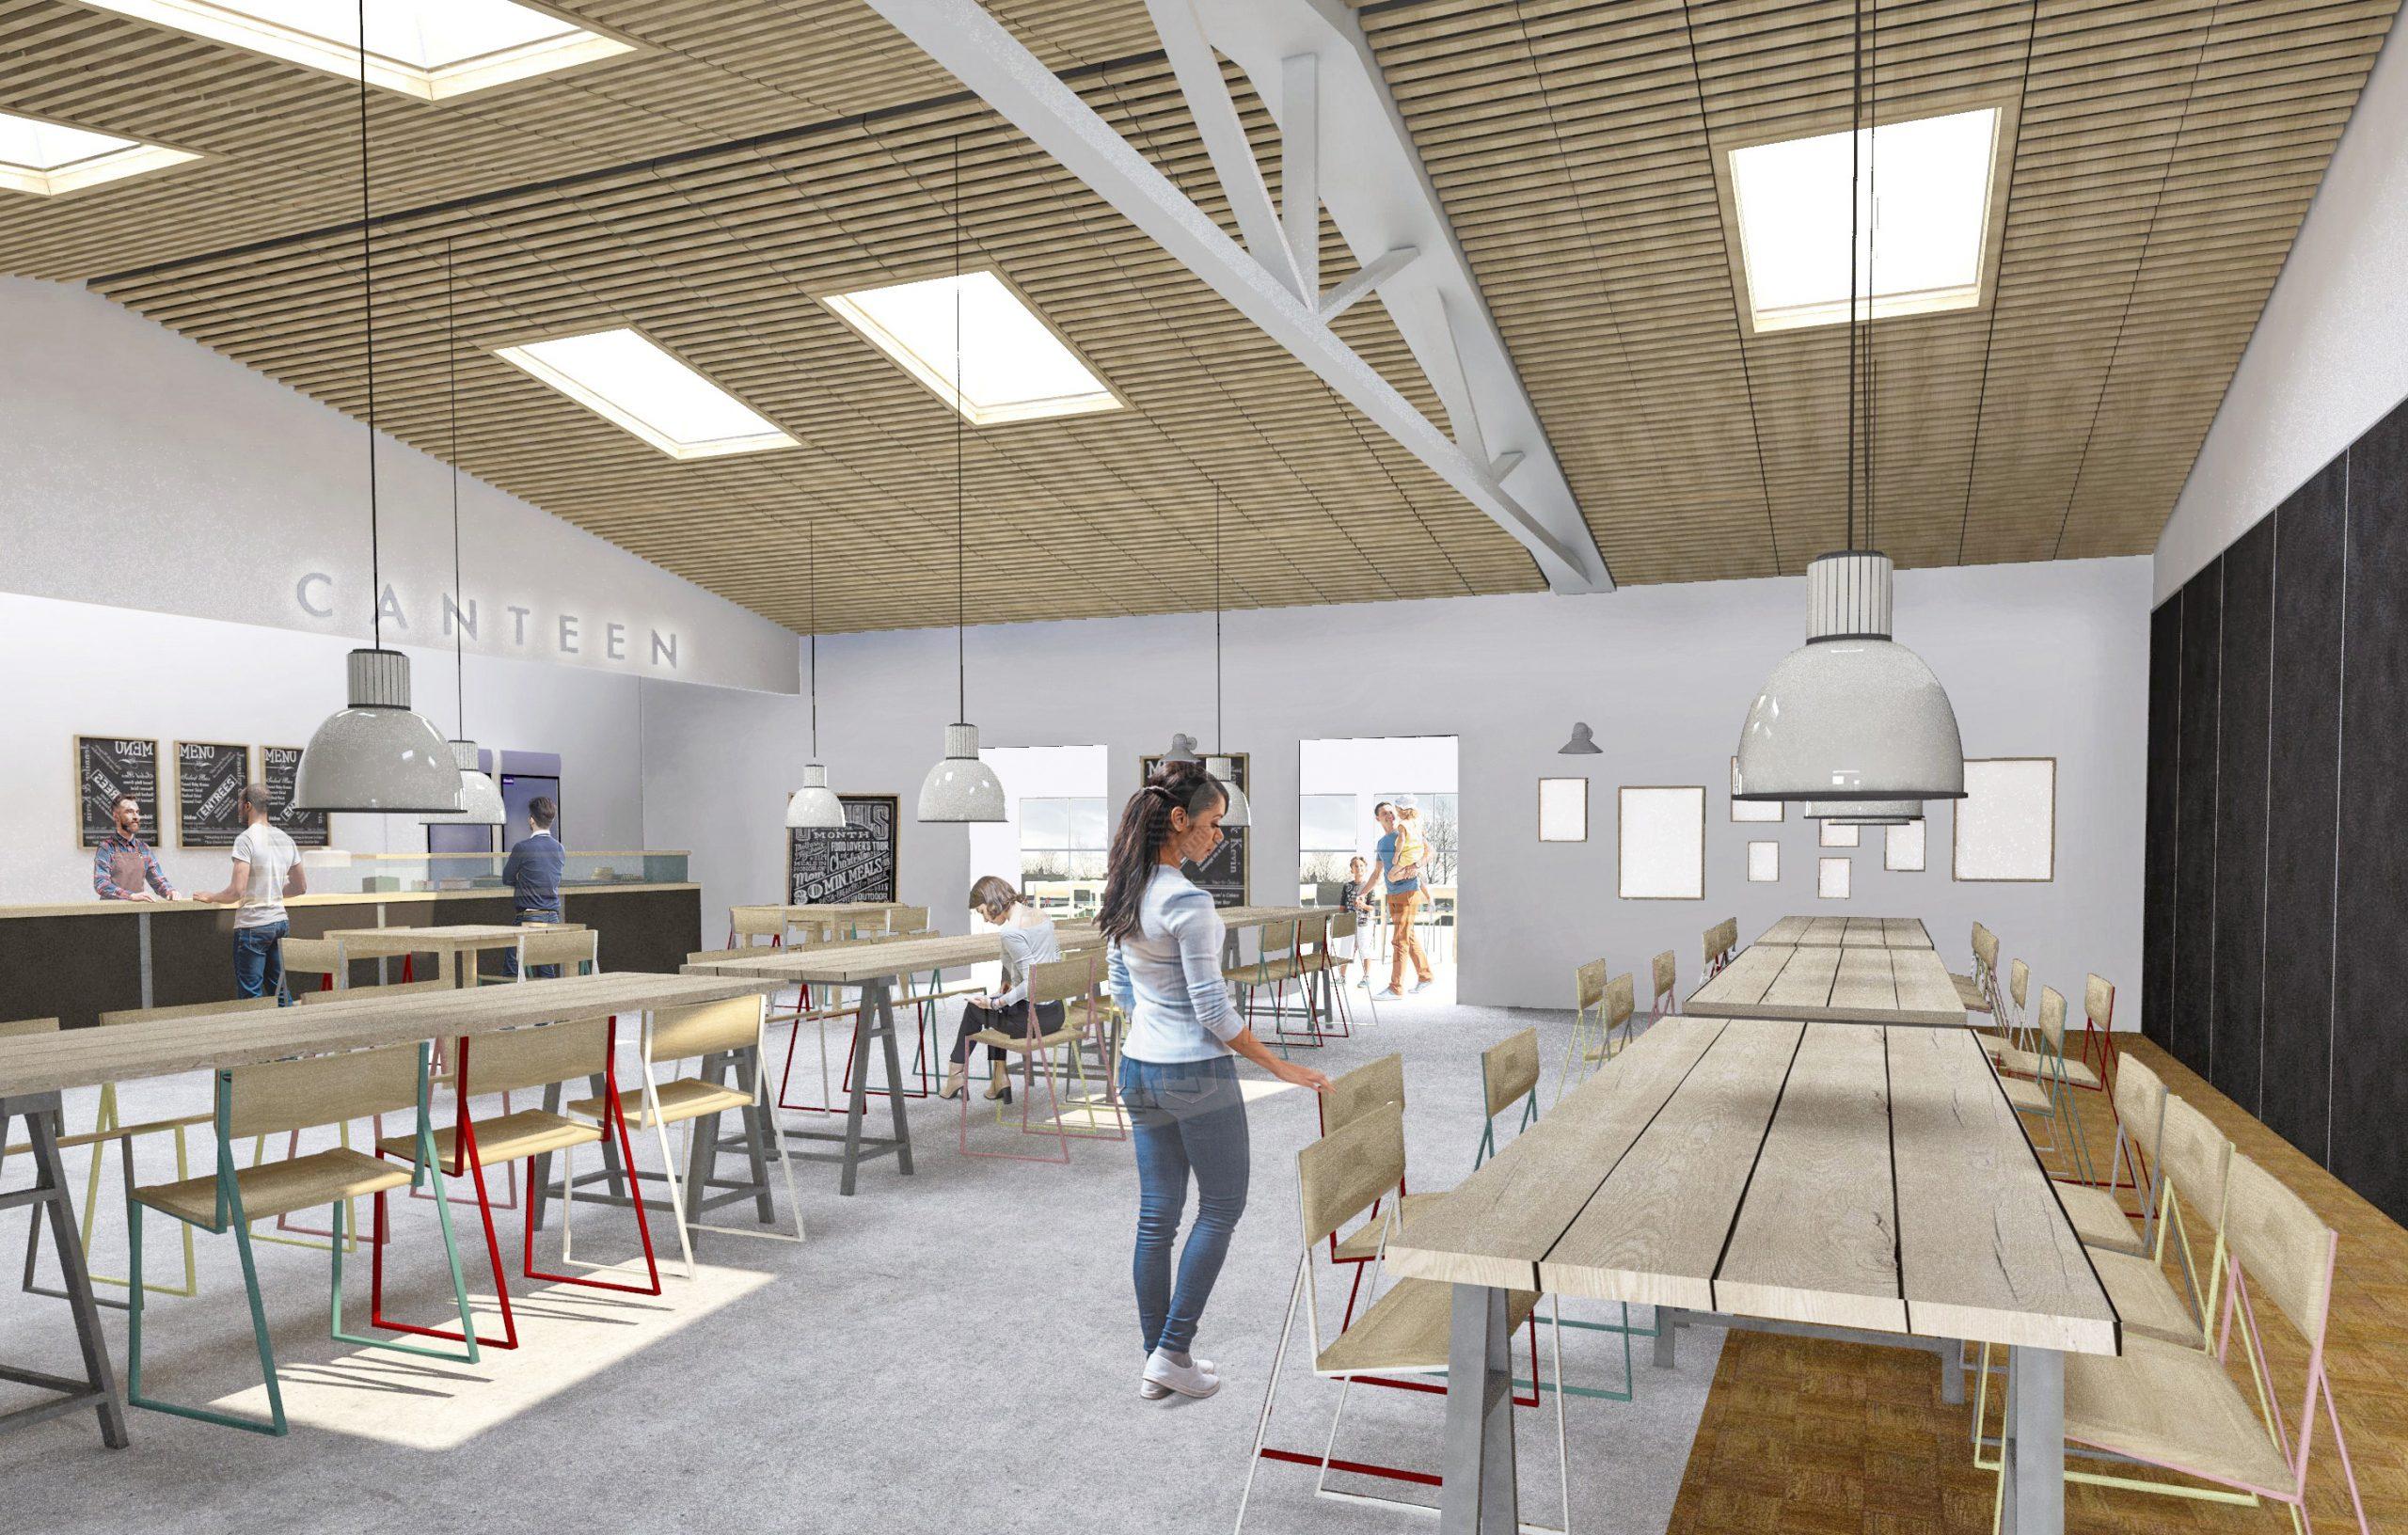 Morgan Works Canteen